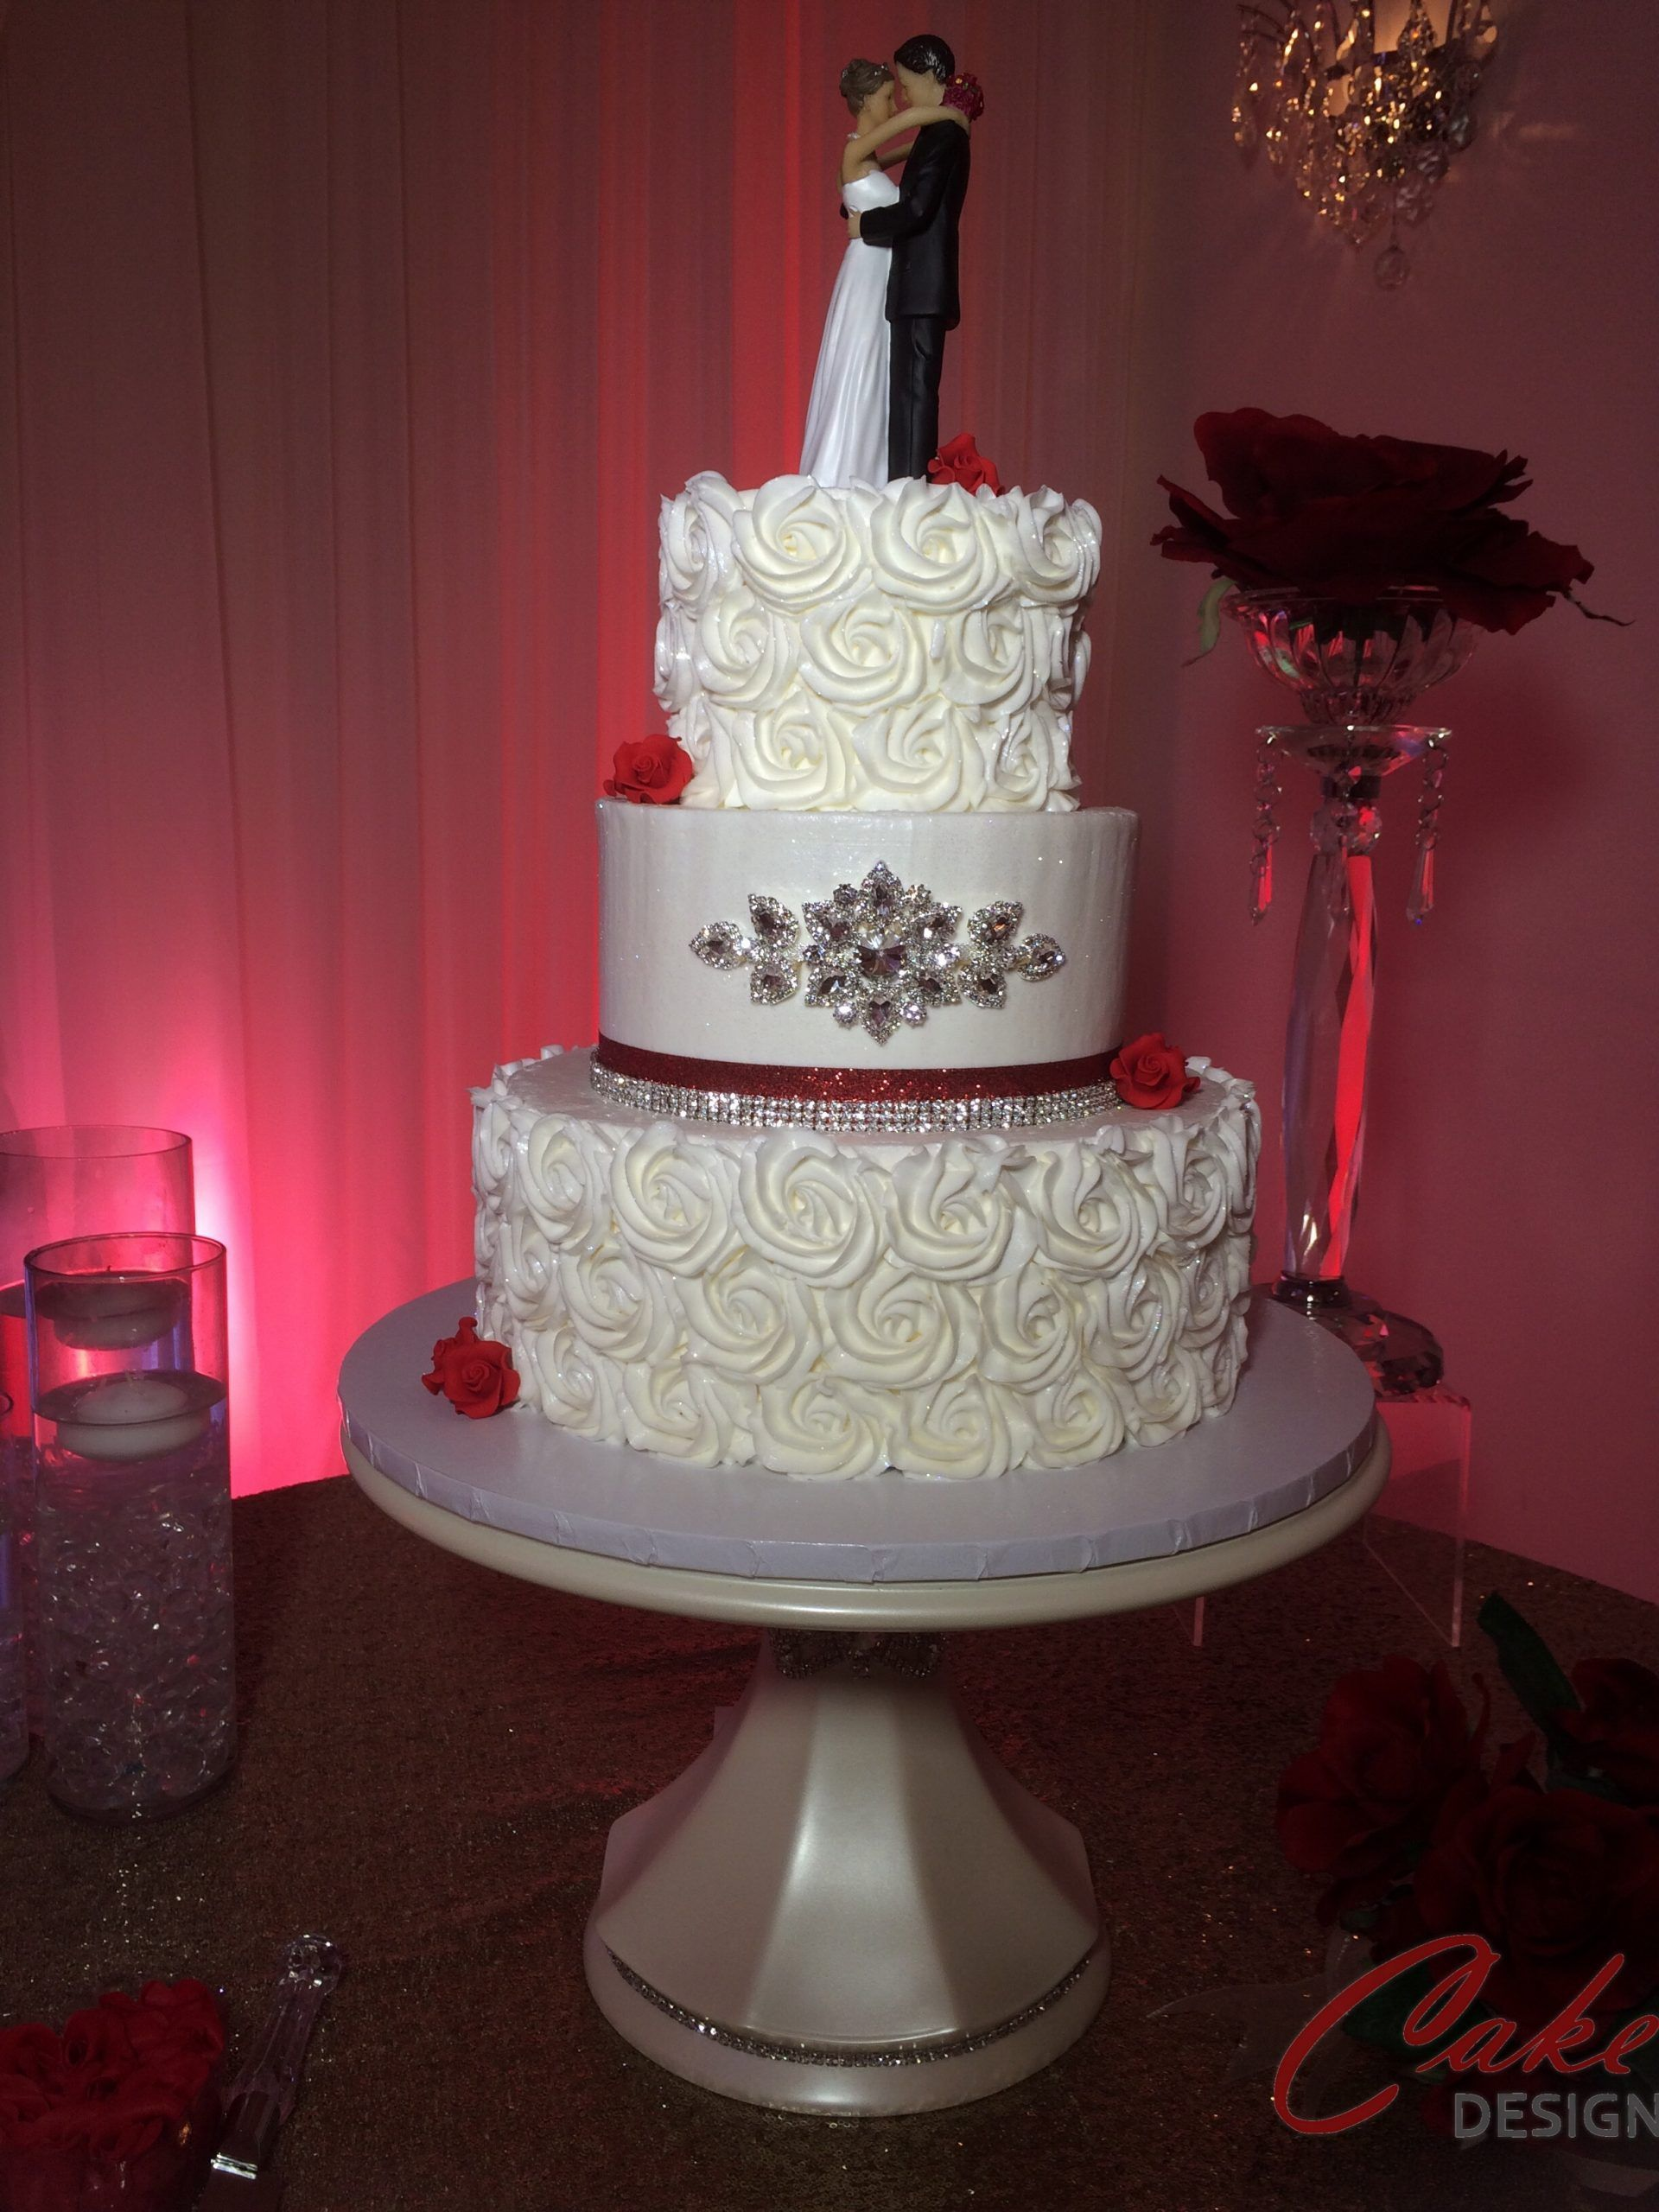 Wedding Cake Bakery Near Me For Wedding Ideas Wedding Ideas Makeit Bakery Cake Ideas Makeit Weddi In 2020 Wedding Cake Maker Diy Wedding Cake Wedding Cake Bakery